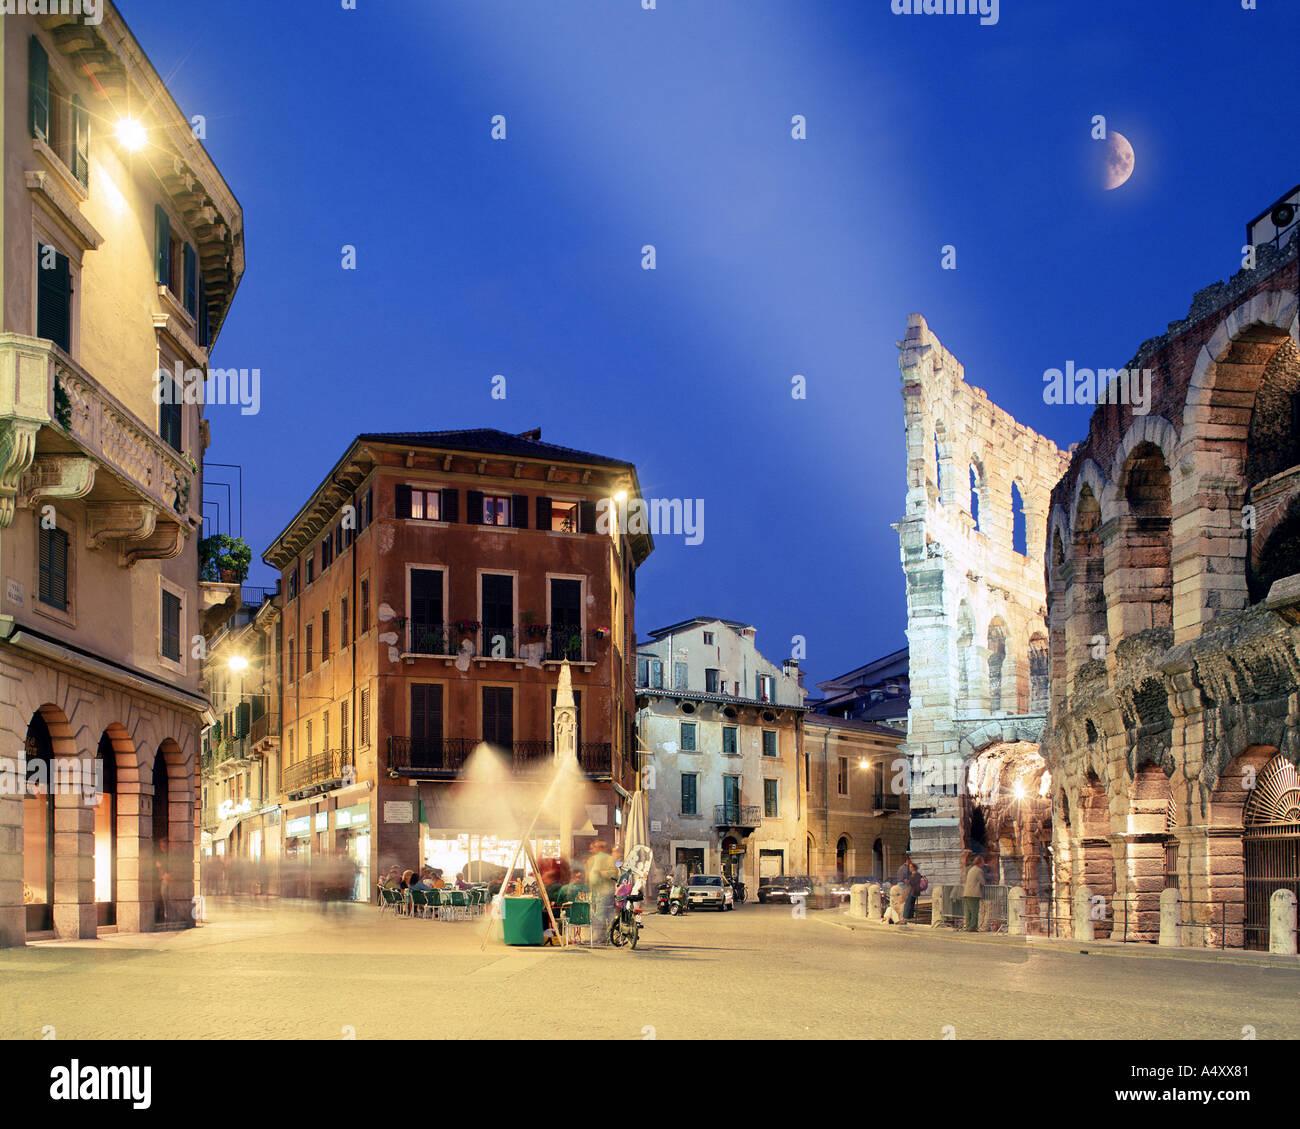 IT - VENETO: Piazza Bra at Verona - Stock Image